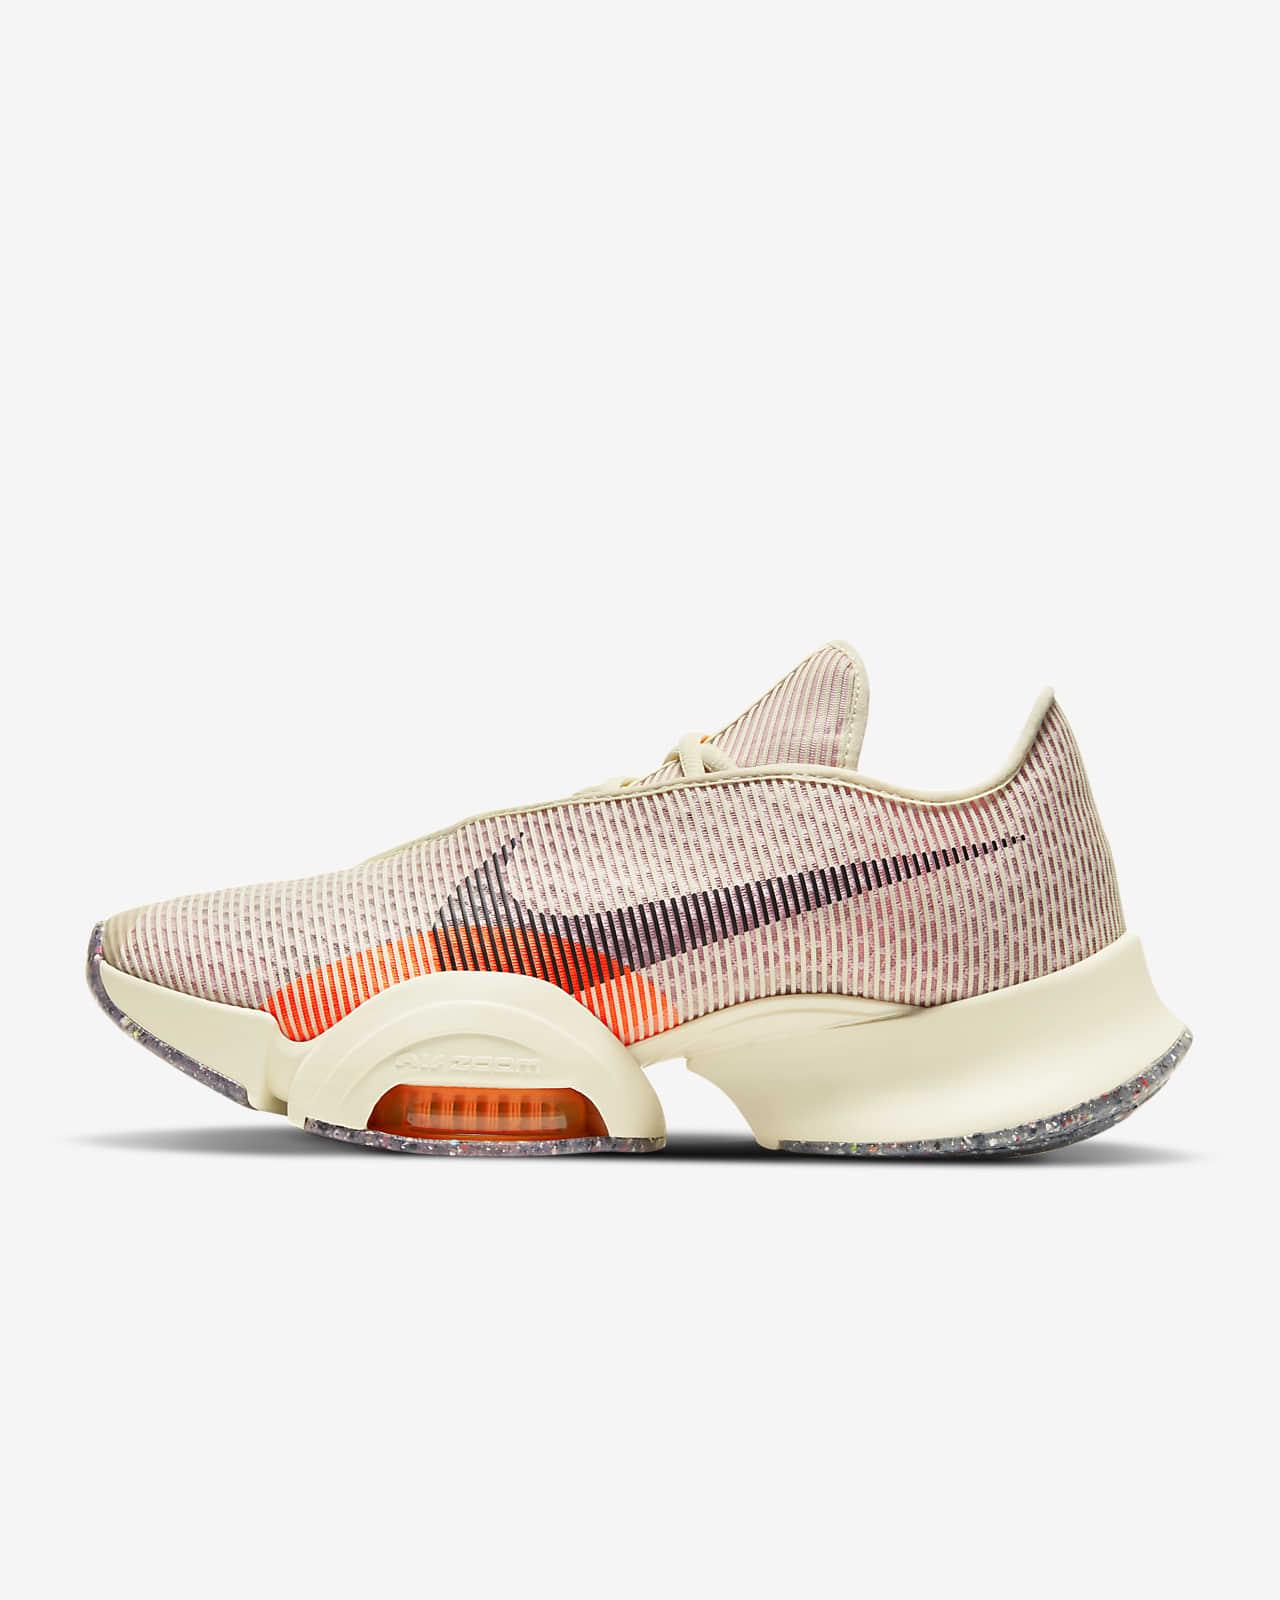 Nike Air Zoom SuperRep 2 Next Nature Men's HIIT Class Shoes